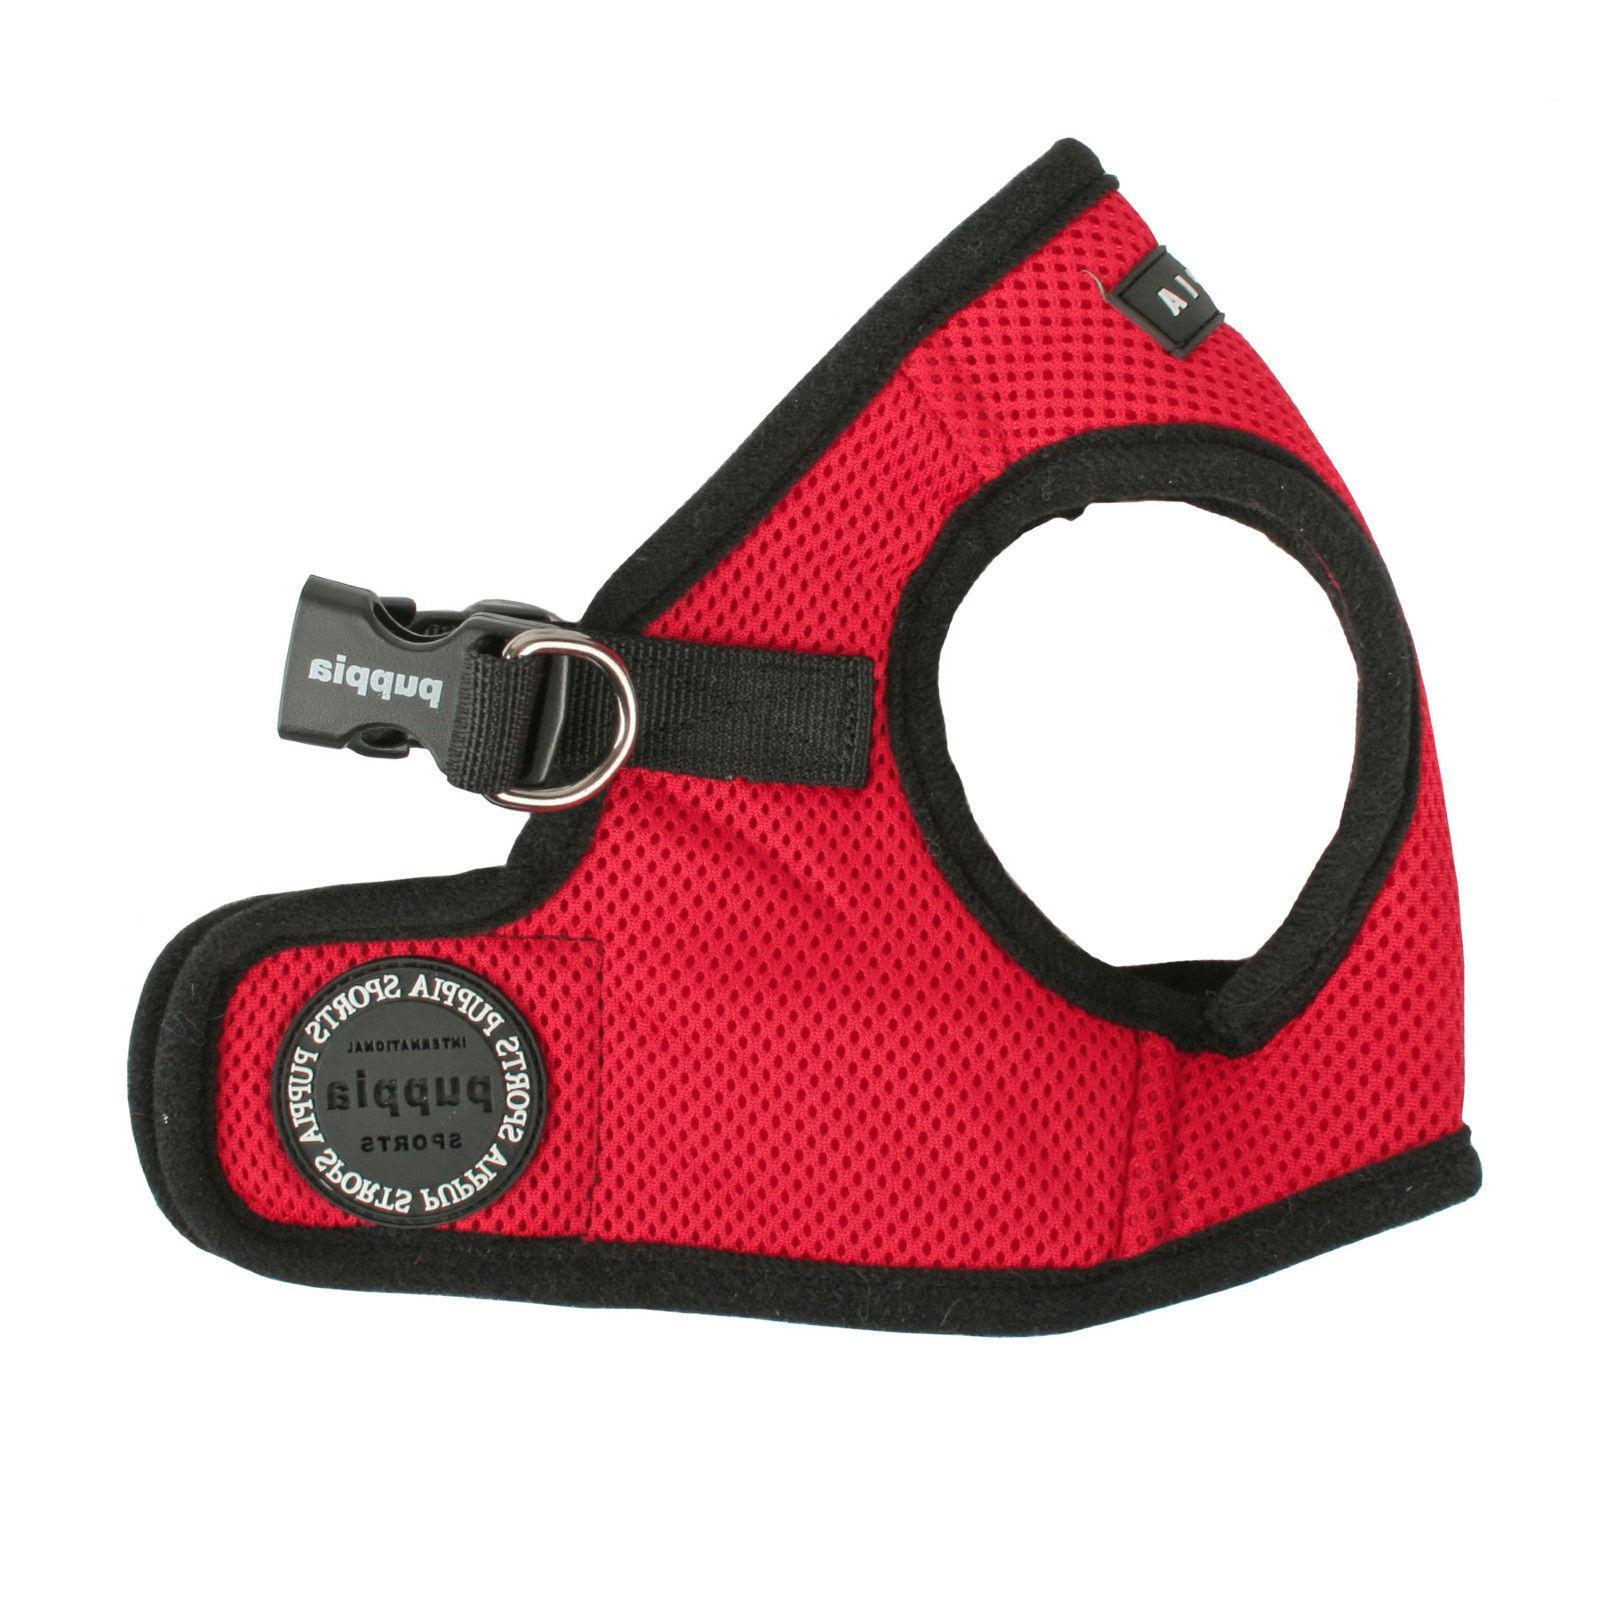 Puppia® Breathable Vest - S M, L, XL, XXL, - AH305